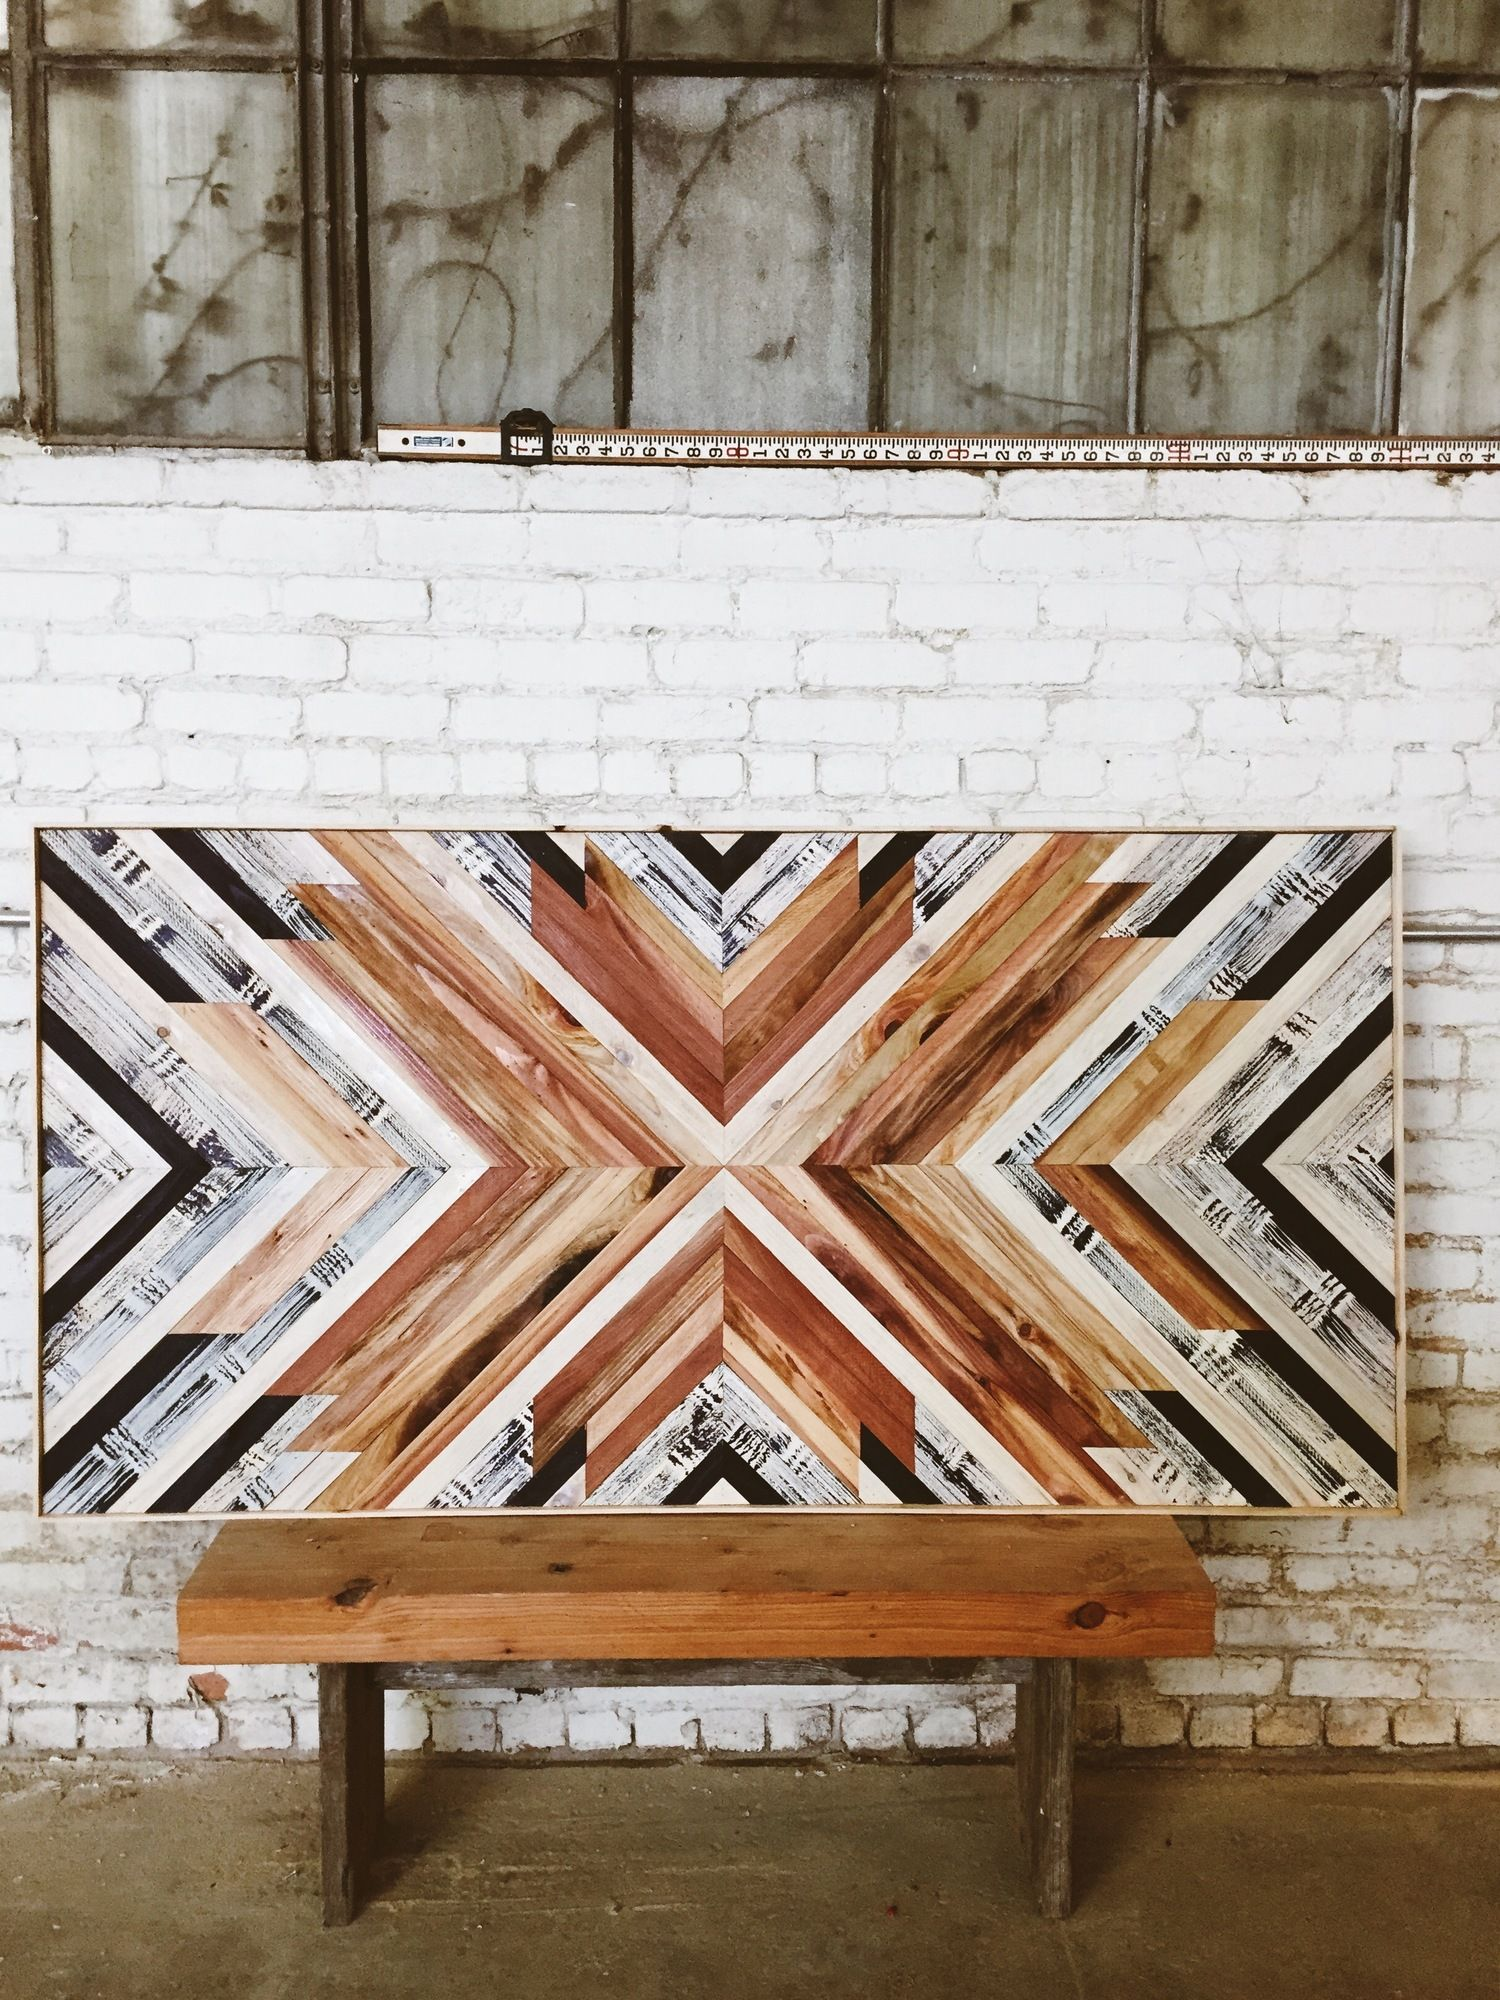 Stunning wood art by aleksandra zee in 2019 wood art - Wall designs with wood ...